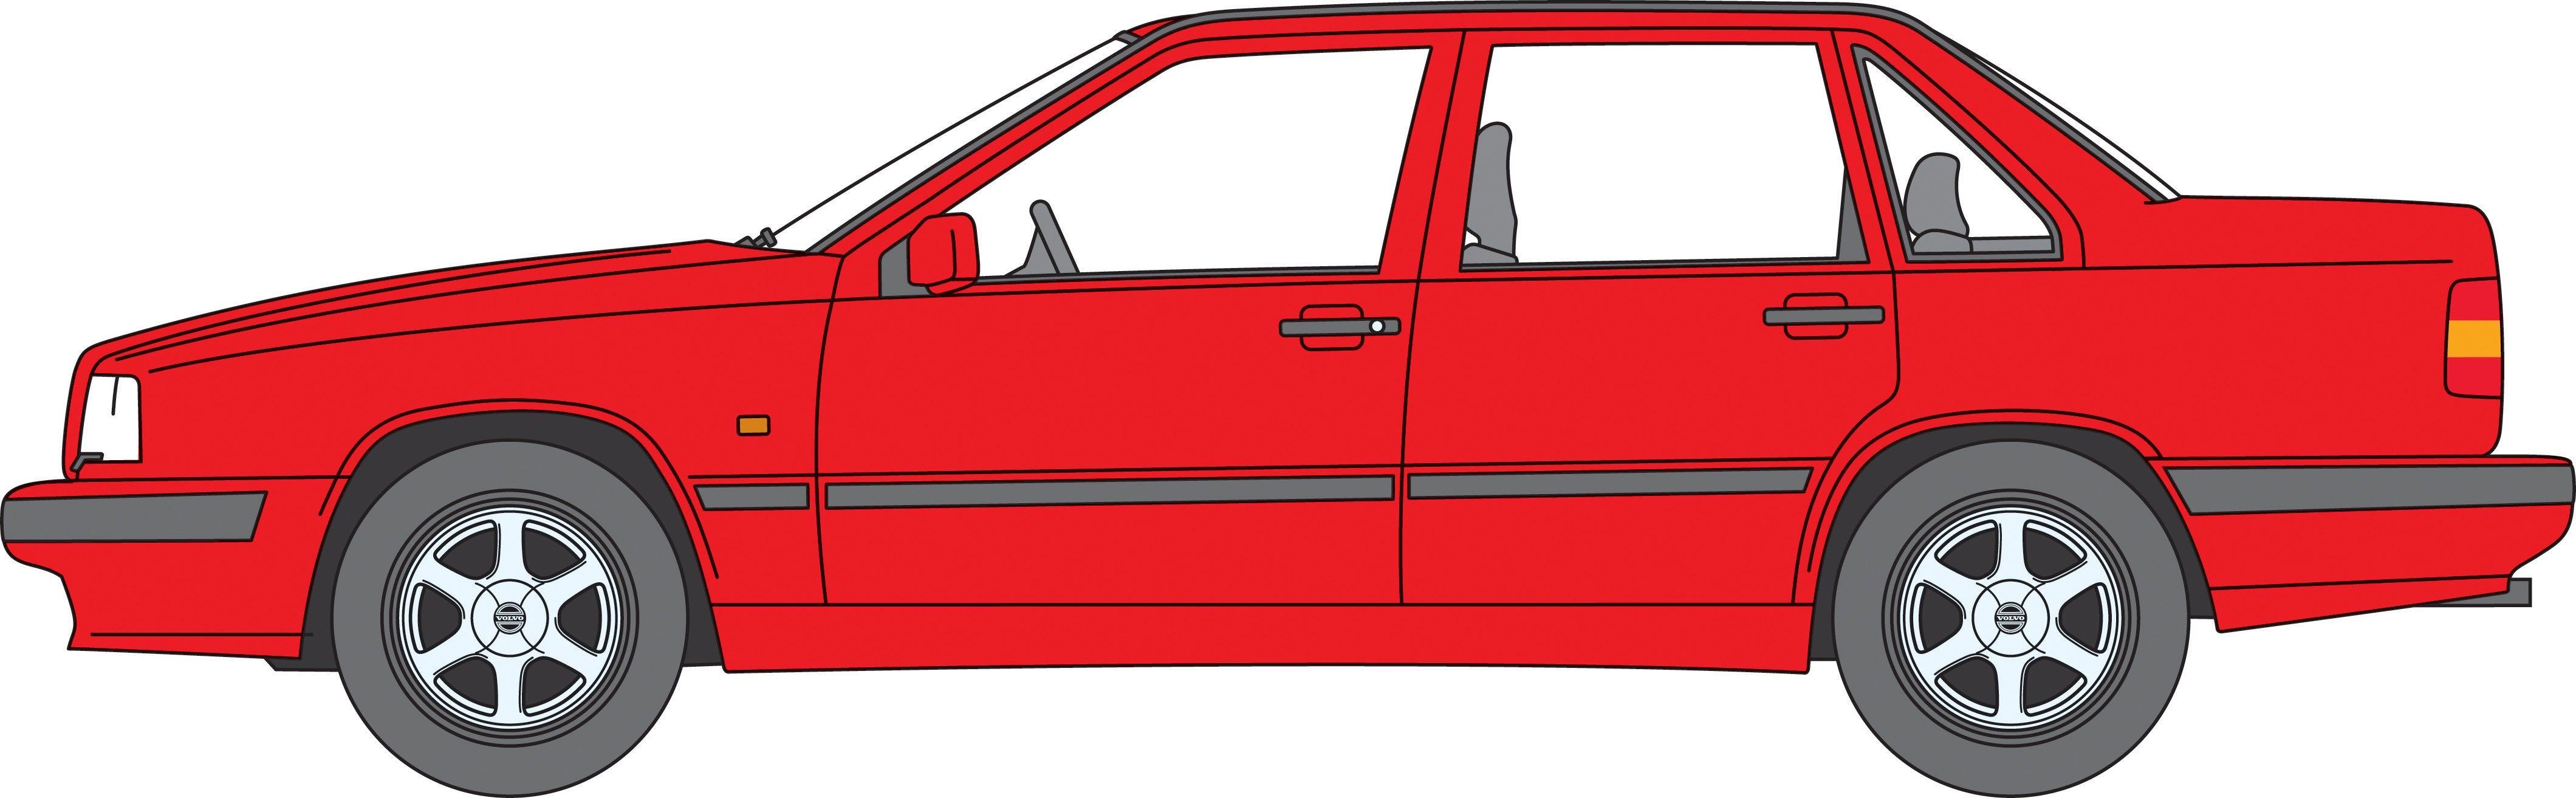 Volvo 850 -  850, 854, base, red, sedan